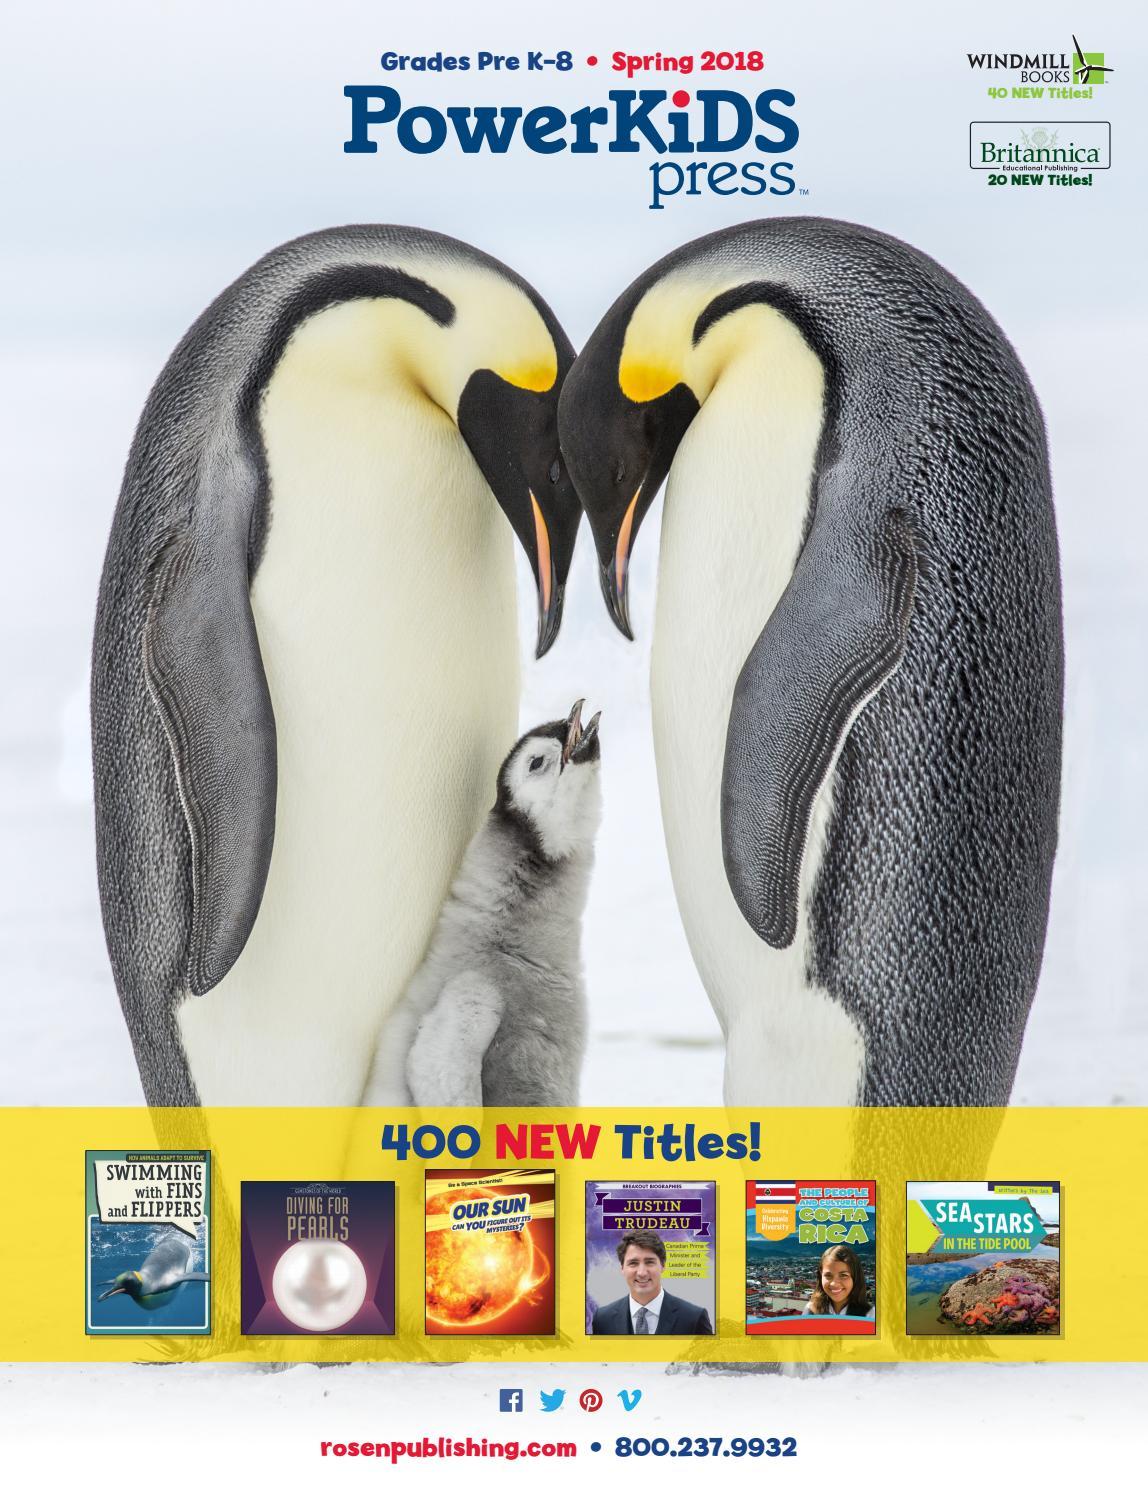 Powerkids Spring 2018 Catalog by Rosen Publishing - issuu